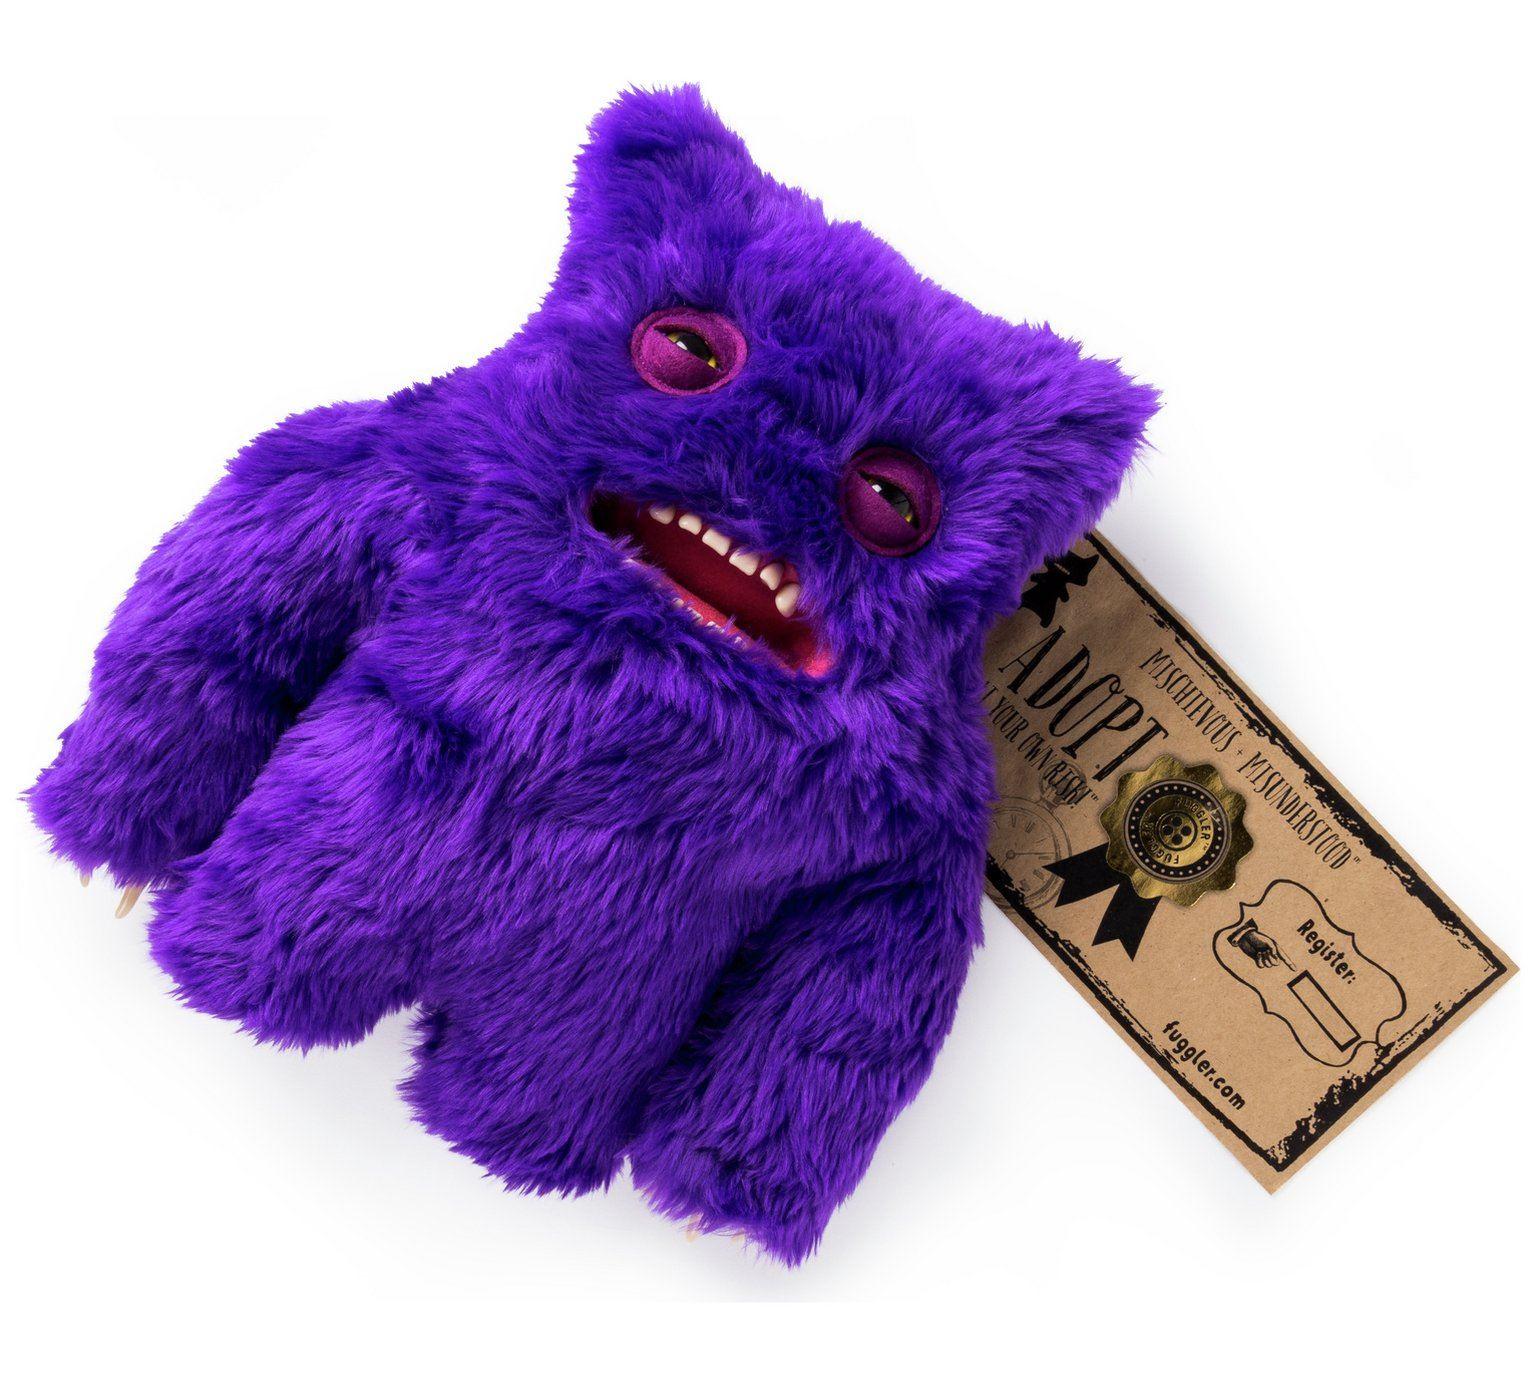 Fuggler-Funny-Uggly-Monsters-Blue-Red-Purple-Light-Red-Stuffed-Animal 縮圖 12